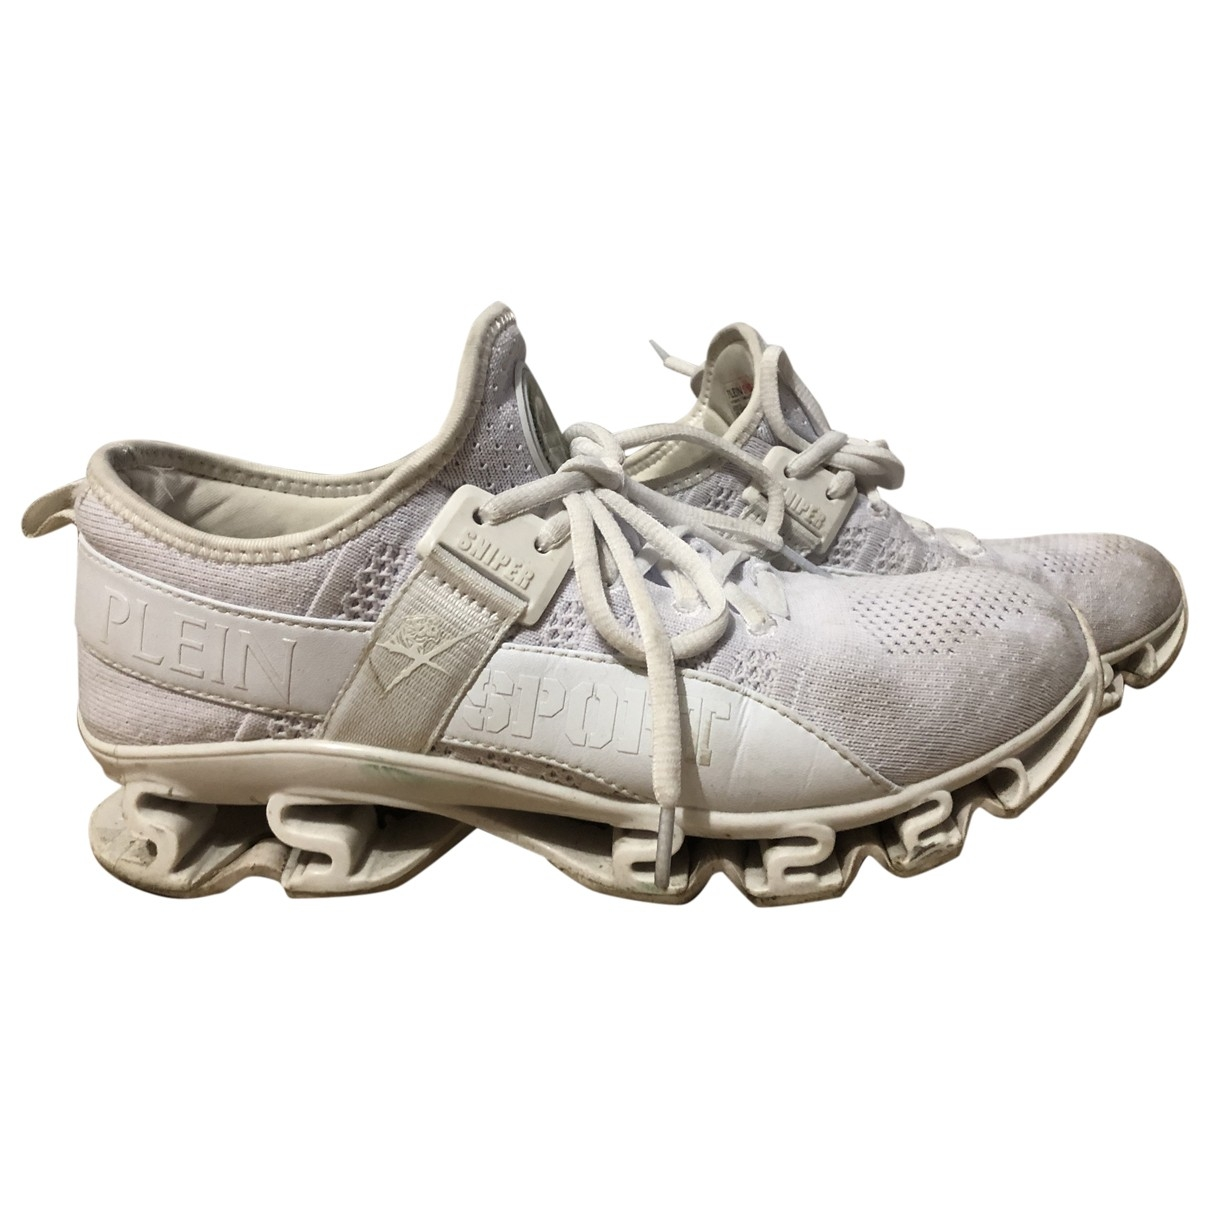 Philipp Plein \N Sneakers in  Weiss Polyester